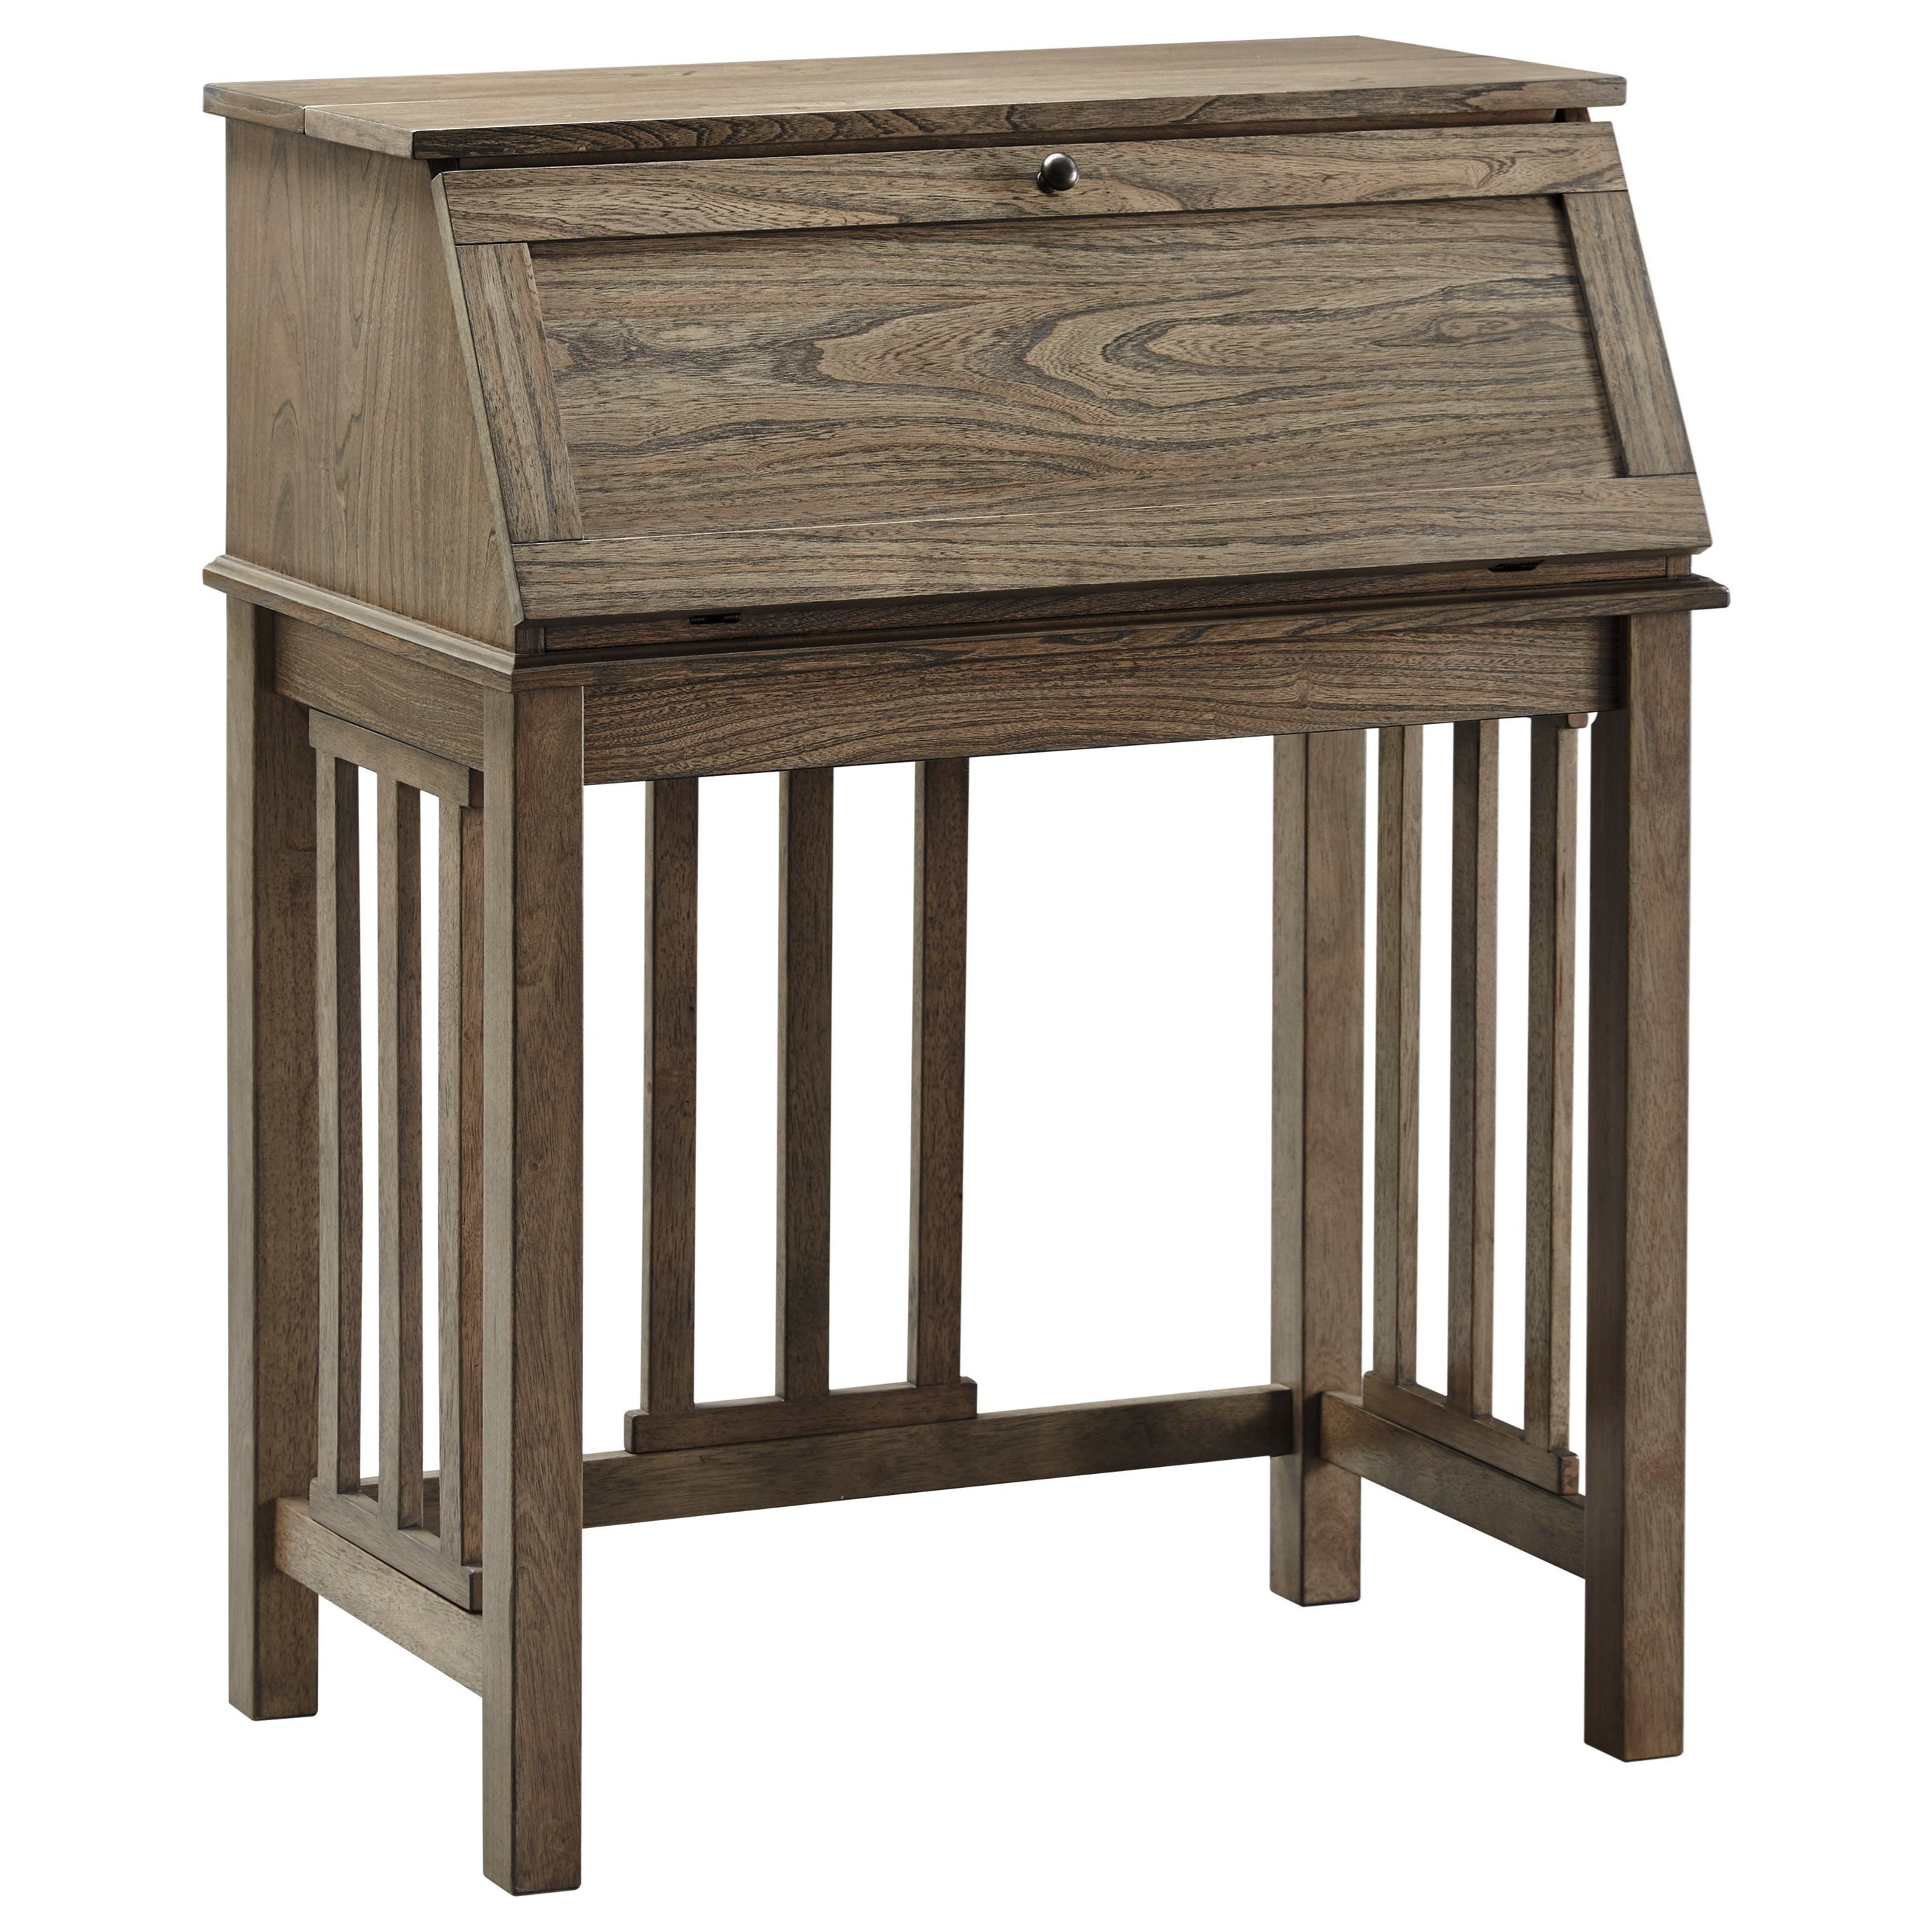 Signature Design By Ashley Dexifield Secretary Home Office Drop Front Desk    Furniture And ApplianceMart   Secretary Desks